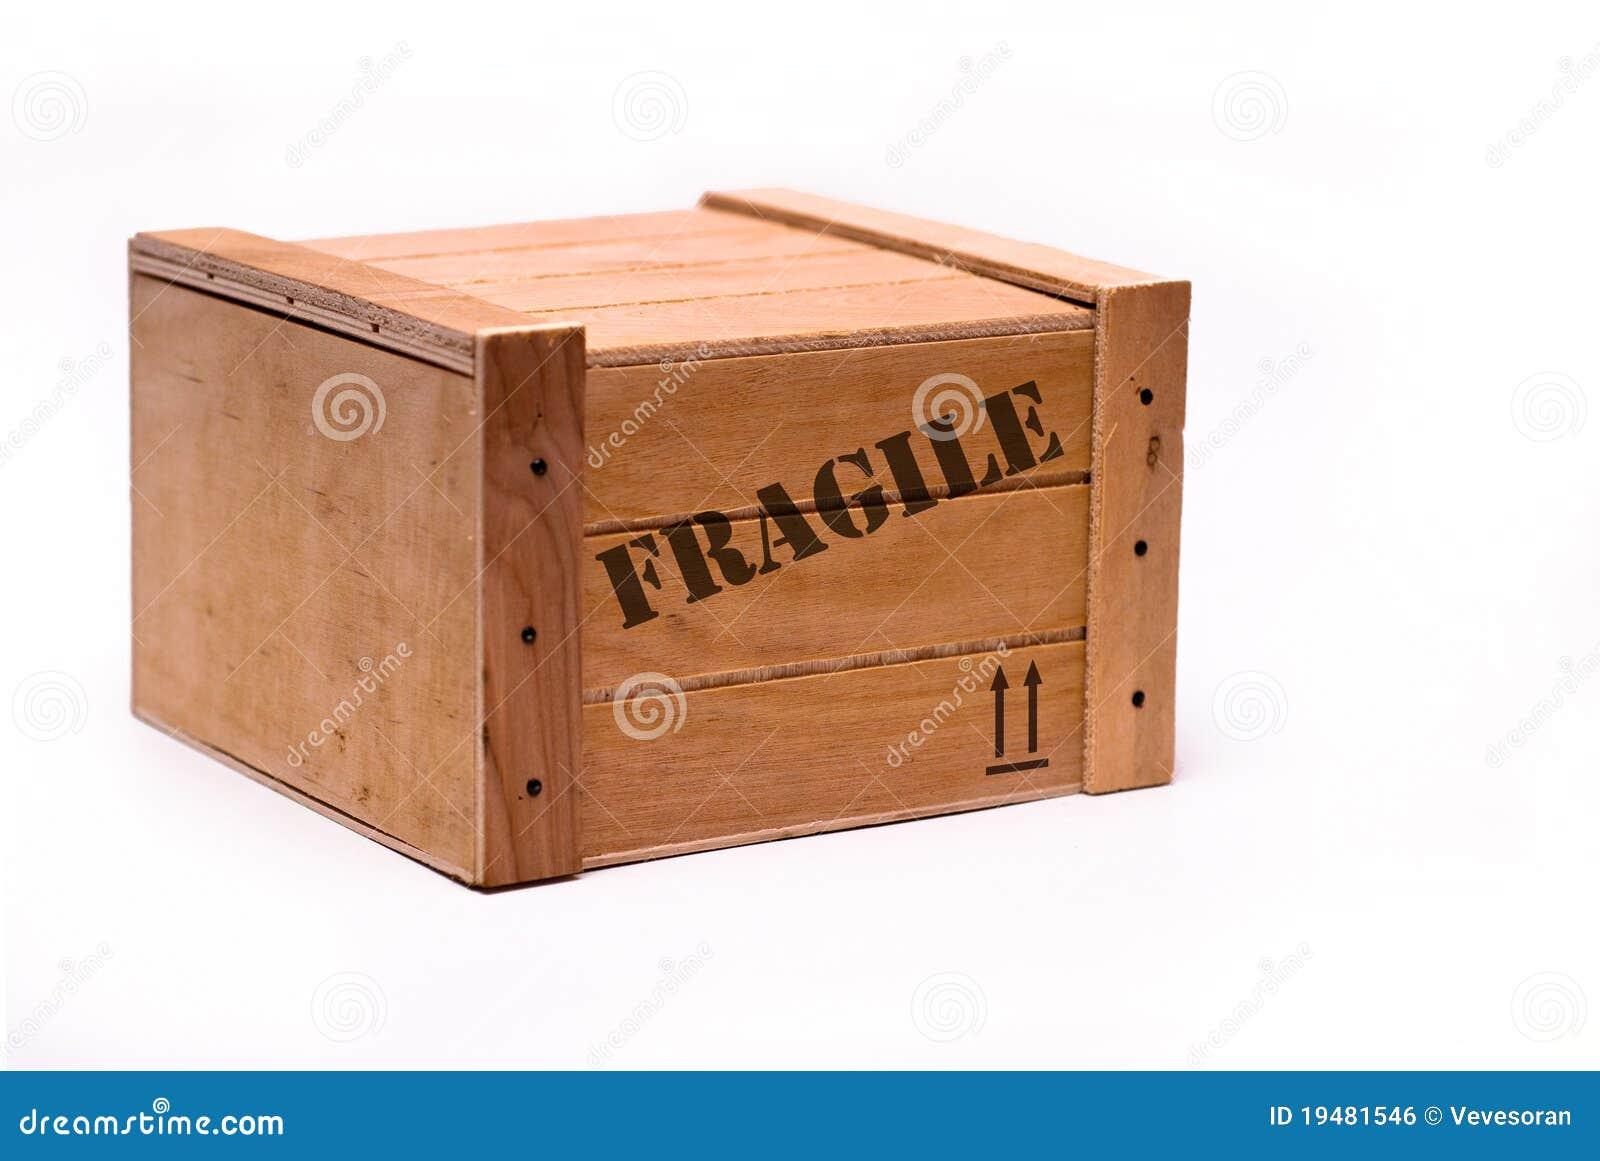 Shipping Box Stock Photo Image Of Mail Ship Timber